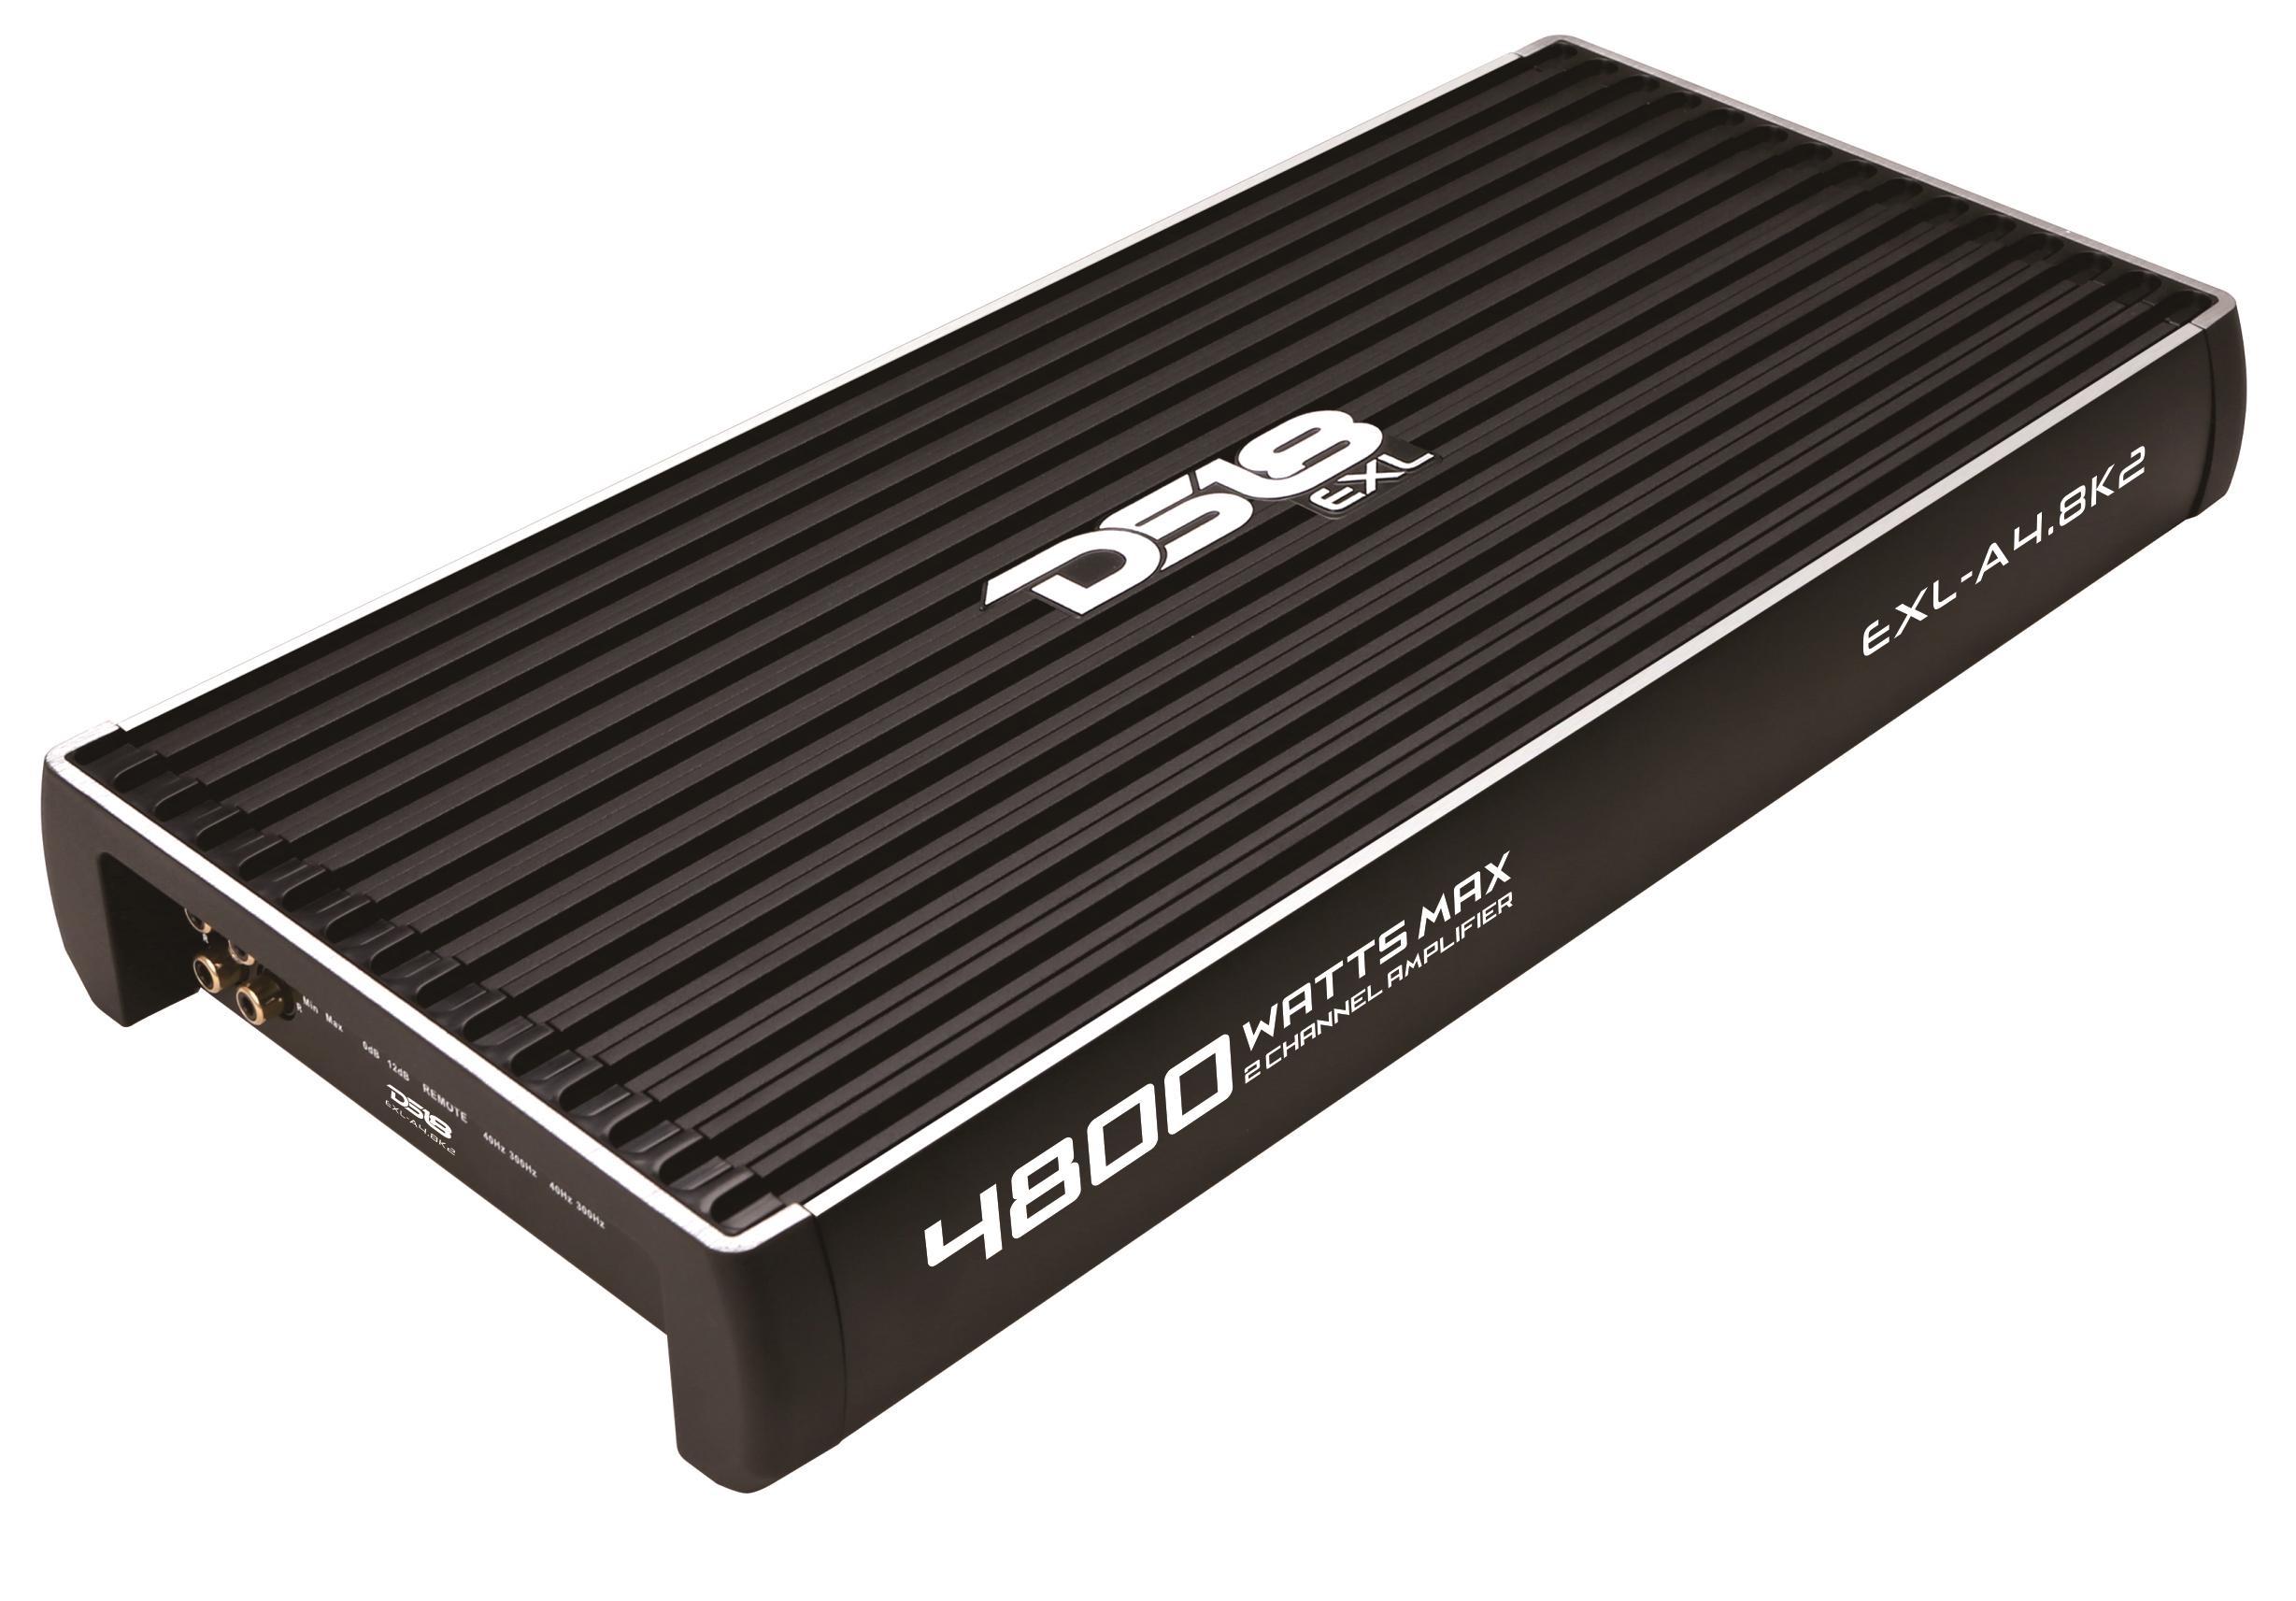 Thompsons Ltd Ds18 Exl A48k2 Series Car Audio 2 Channel Amp Wiring Kit Pyramid 8ga Stereo 4800 Watt Amplifier